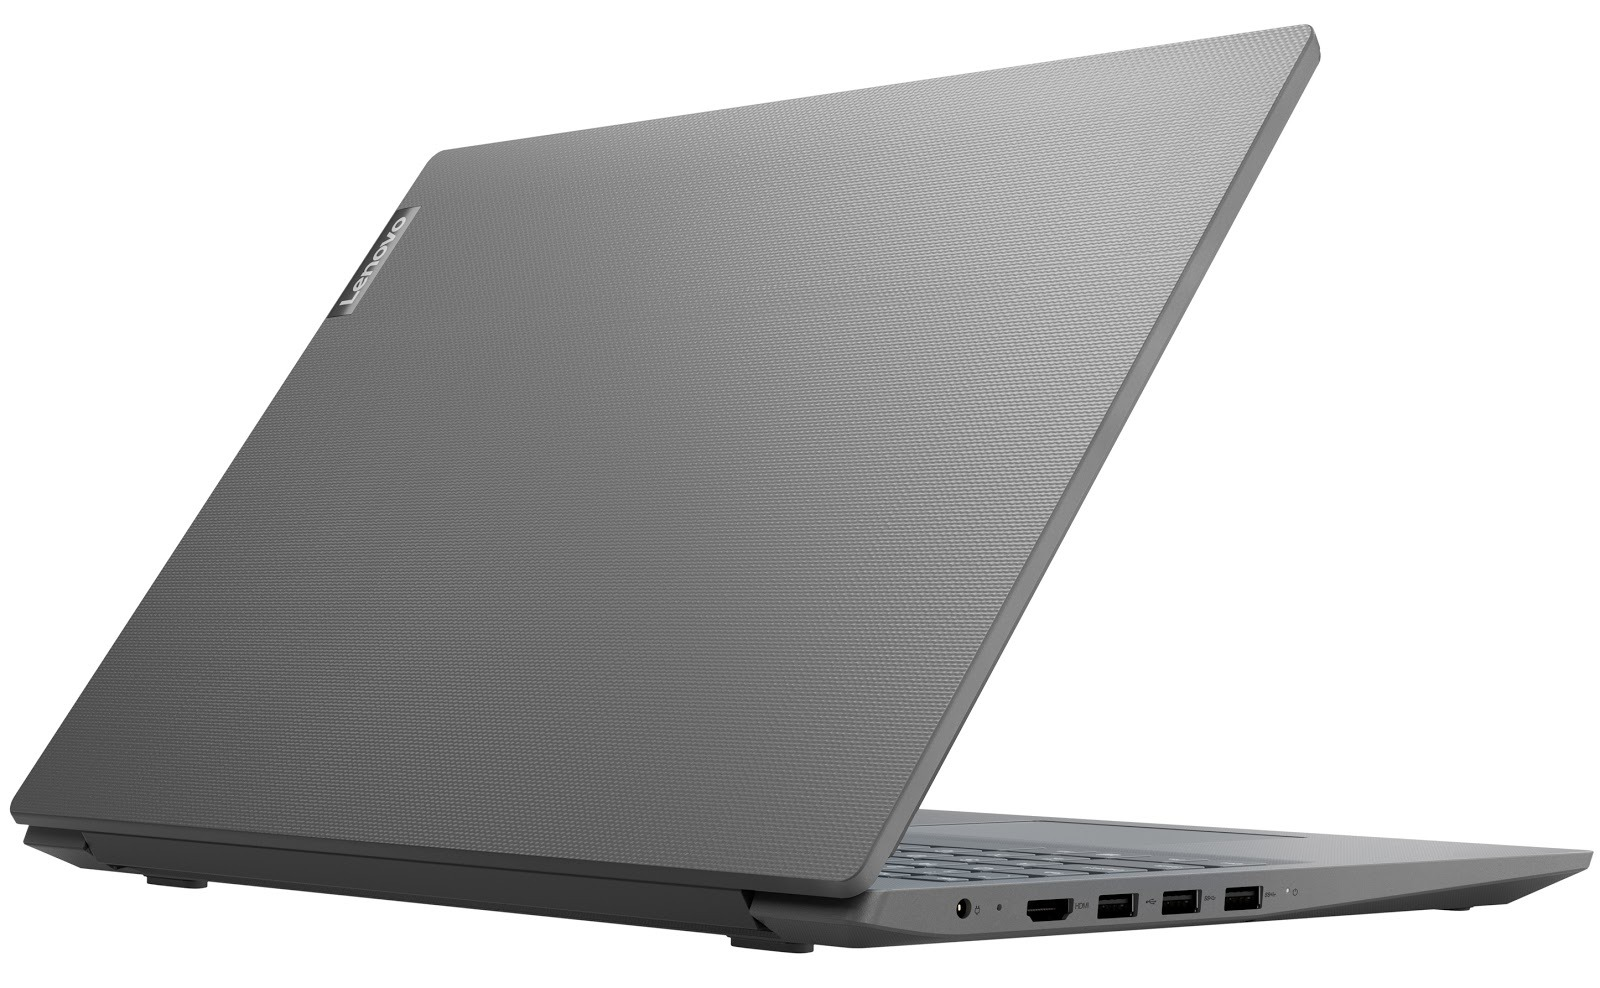 Фото 3. Ноутбук Lenovo V15 ADA Iron Grey (82C7009URU)